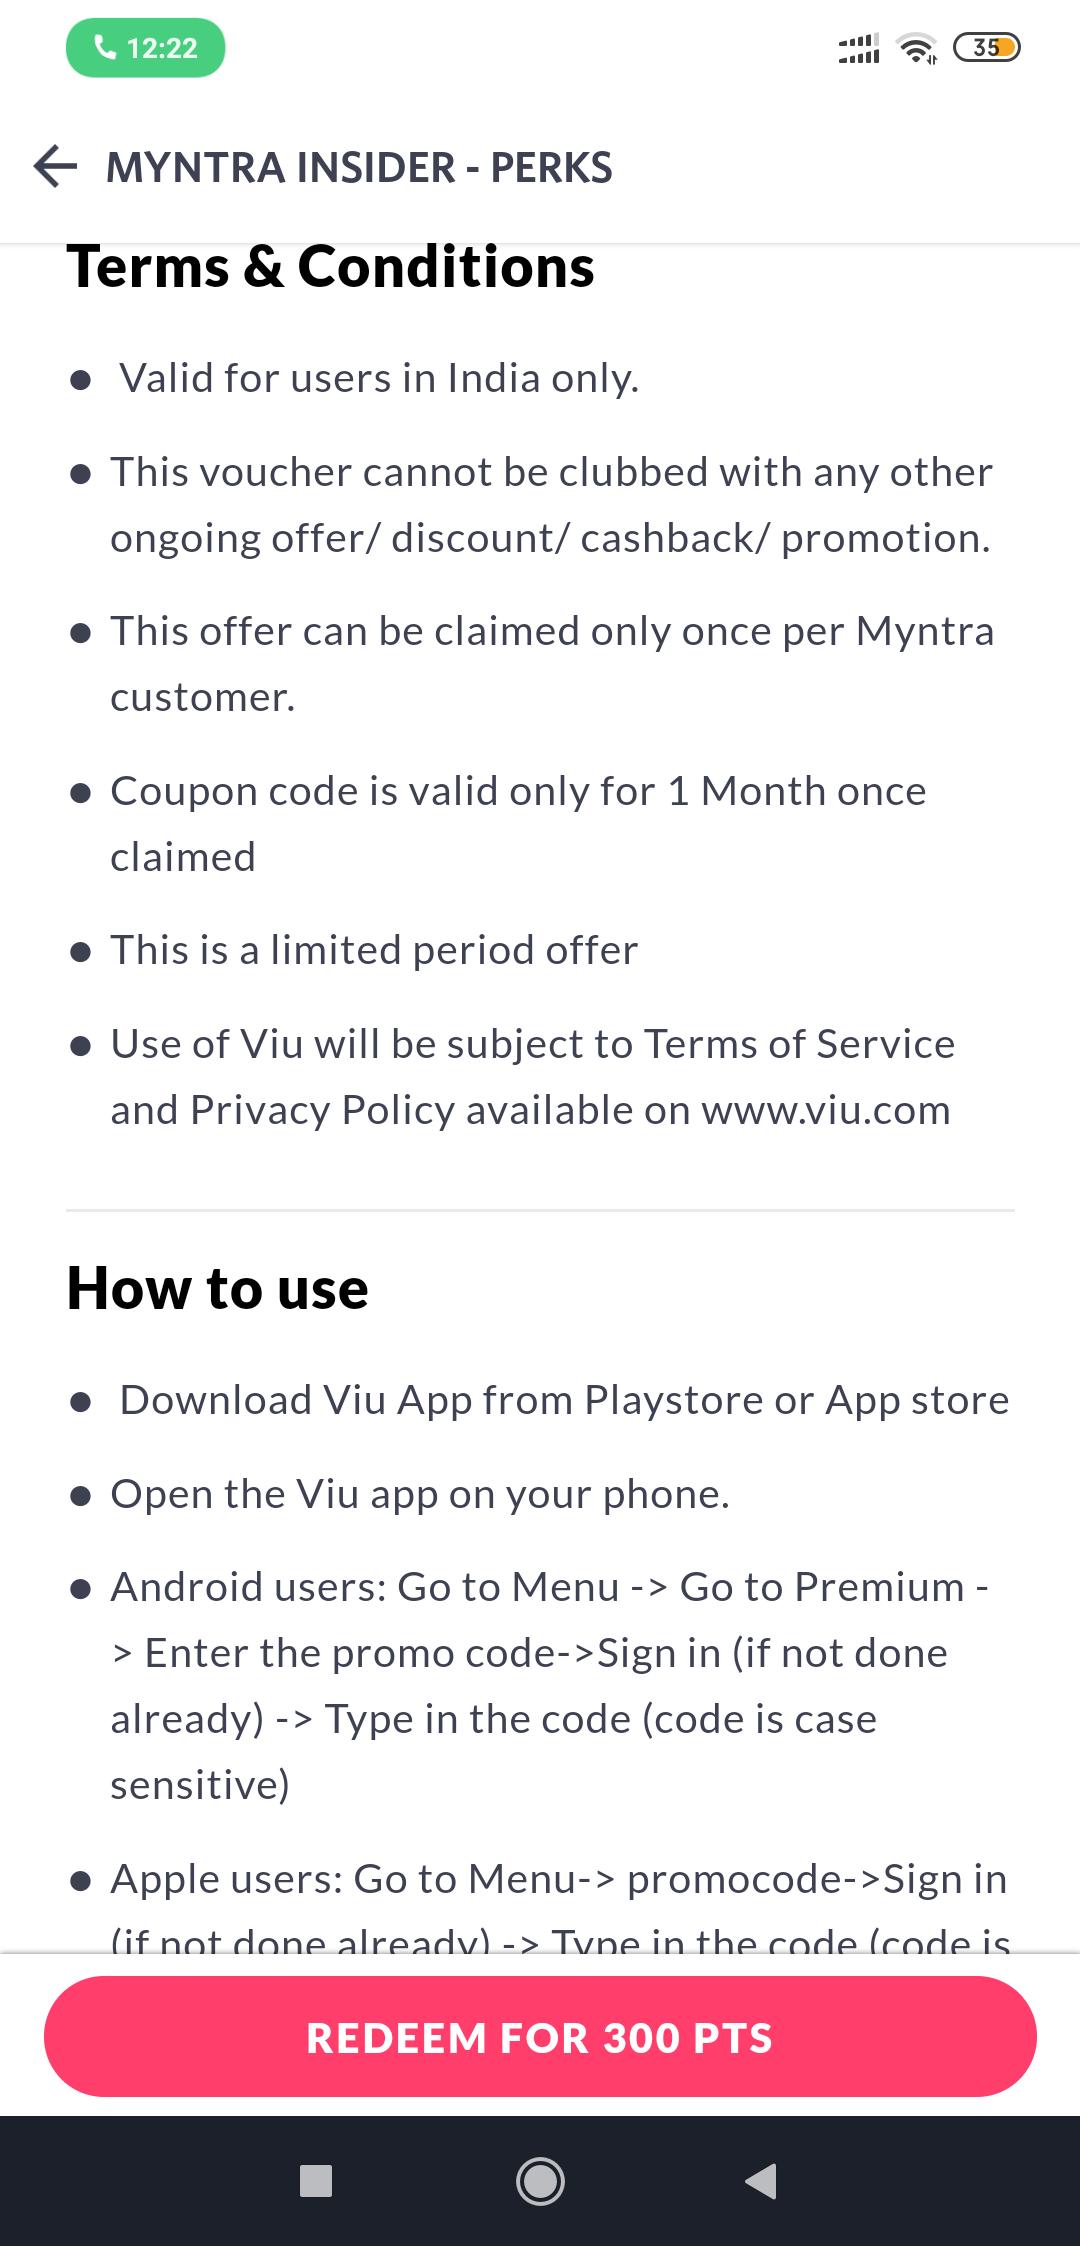 https://cdn0.desidime.com/attachments/photos/585738/original/Screenshot_2019-09-19-00-19-27-265_com.myntra.android.png?1568832642